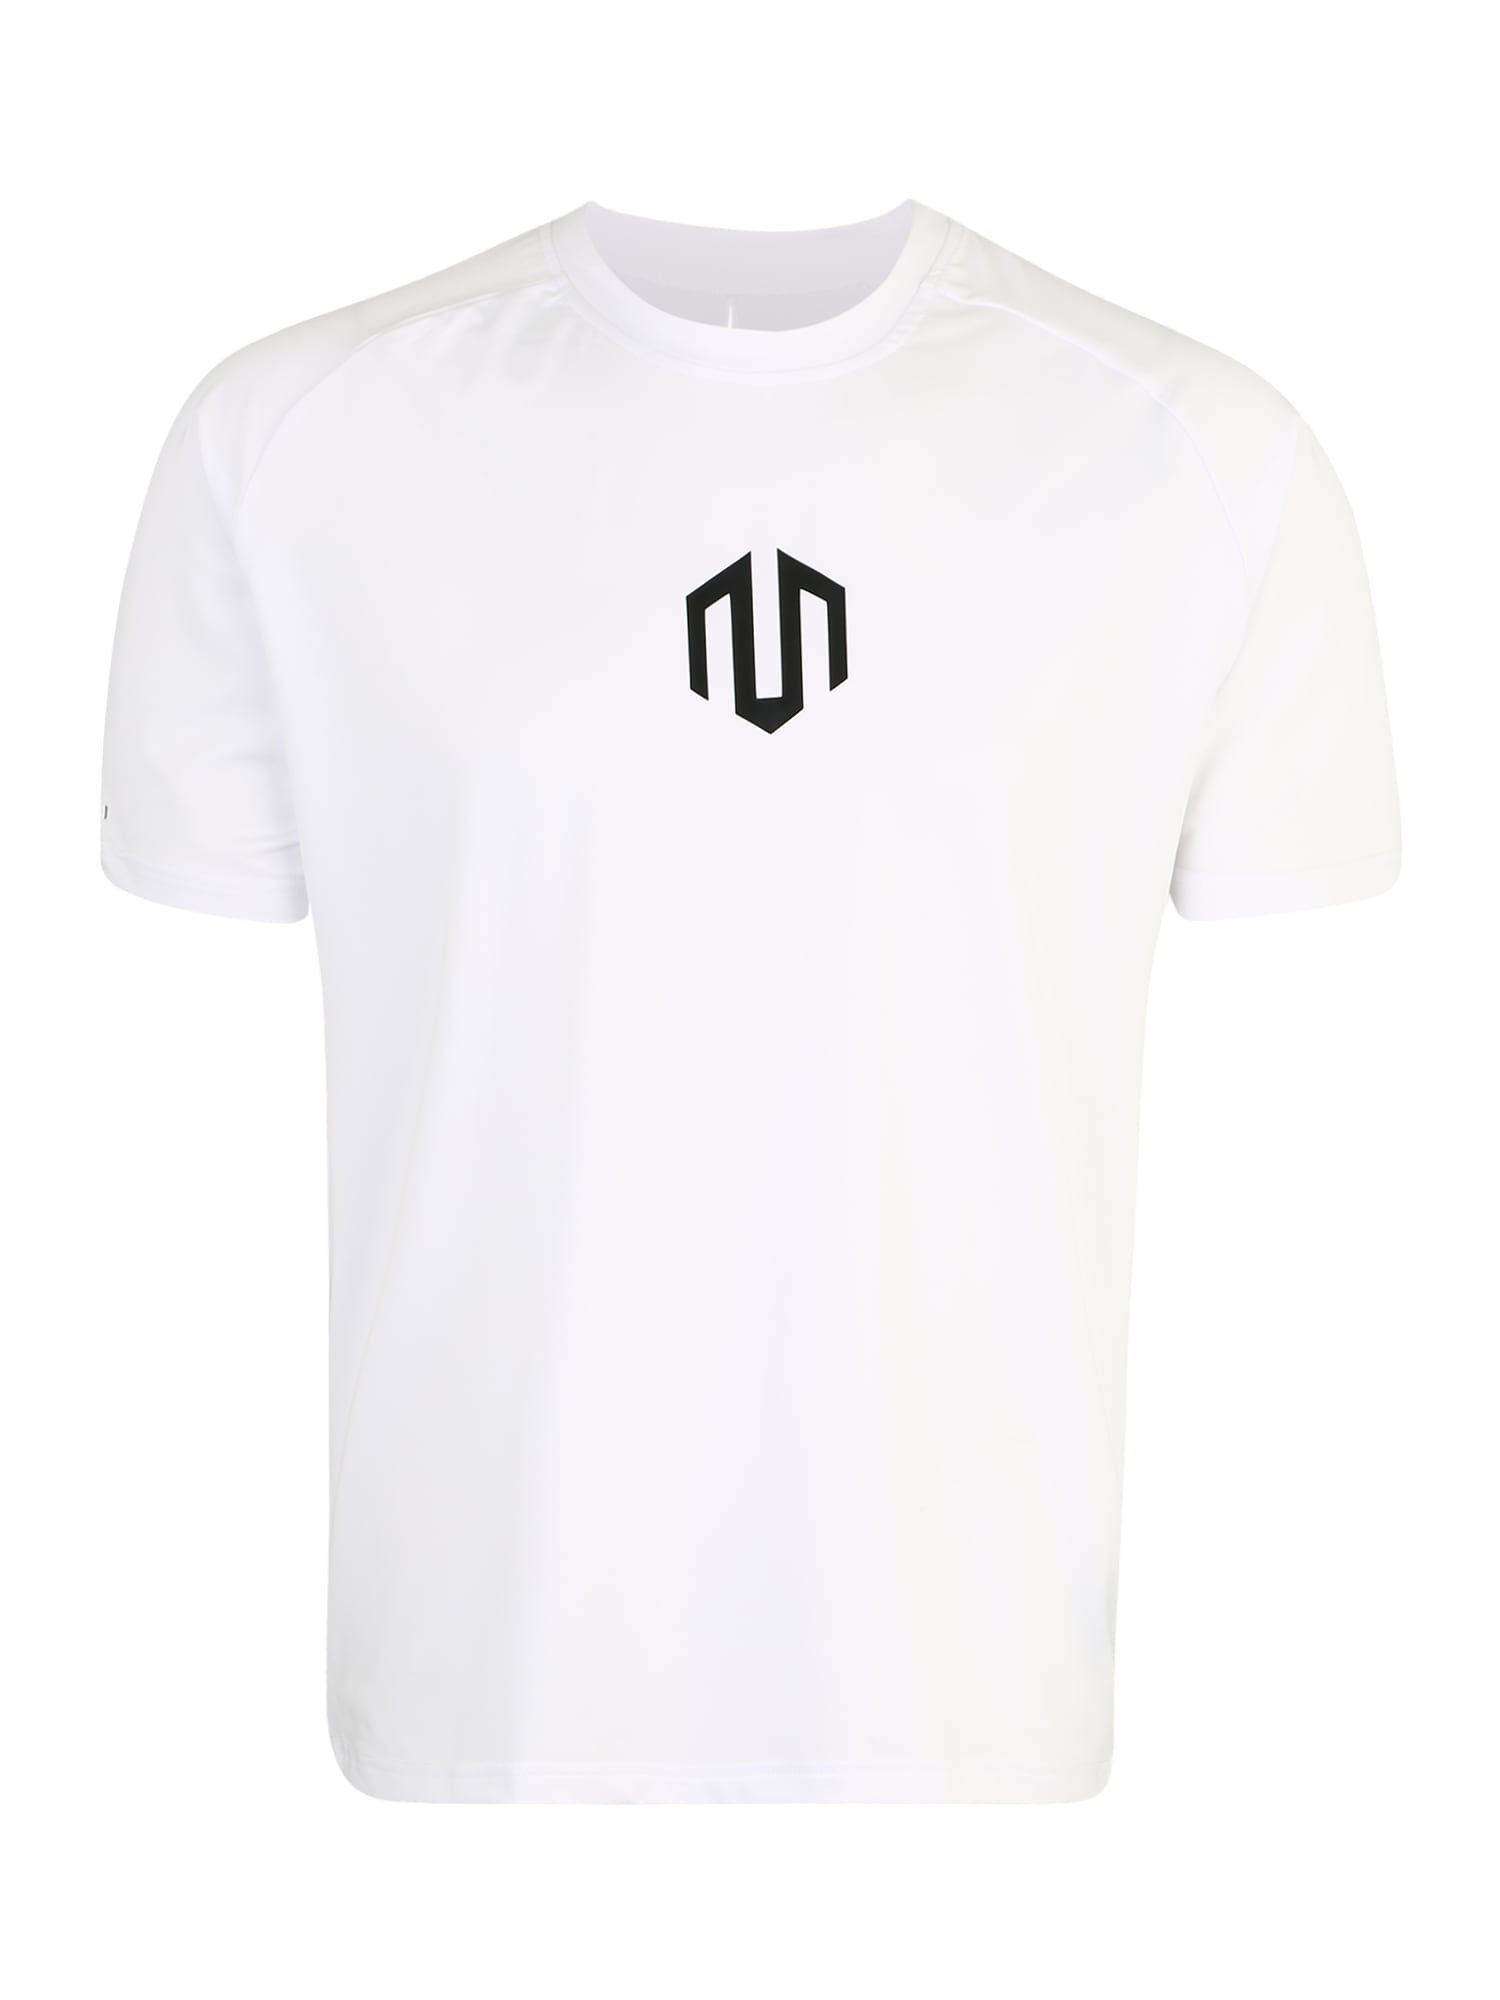 Funkční tričko Endurance Mesh Shirt 2.0 černá bílá MOROTAI